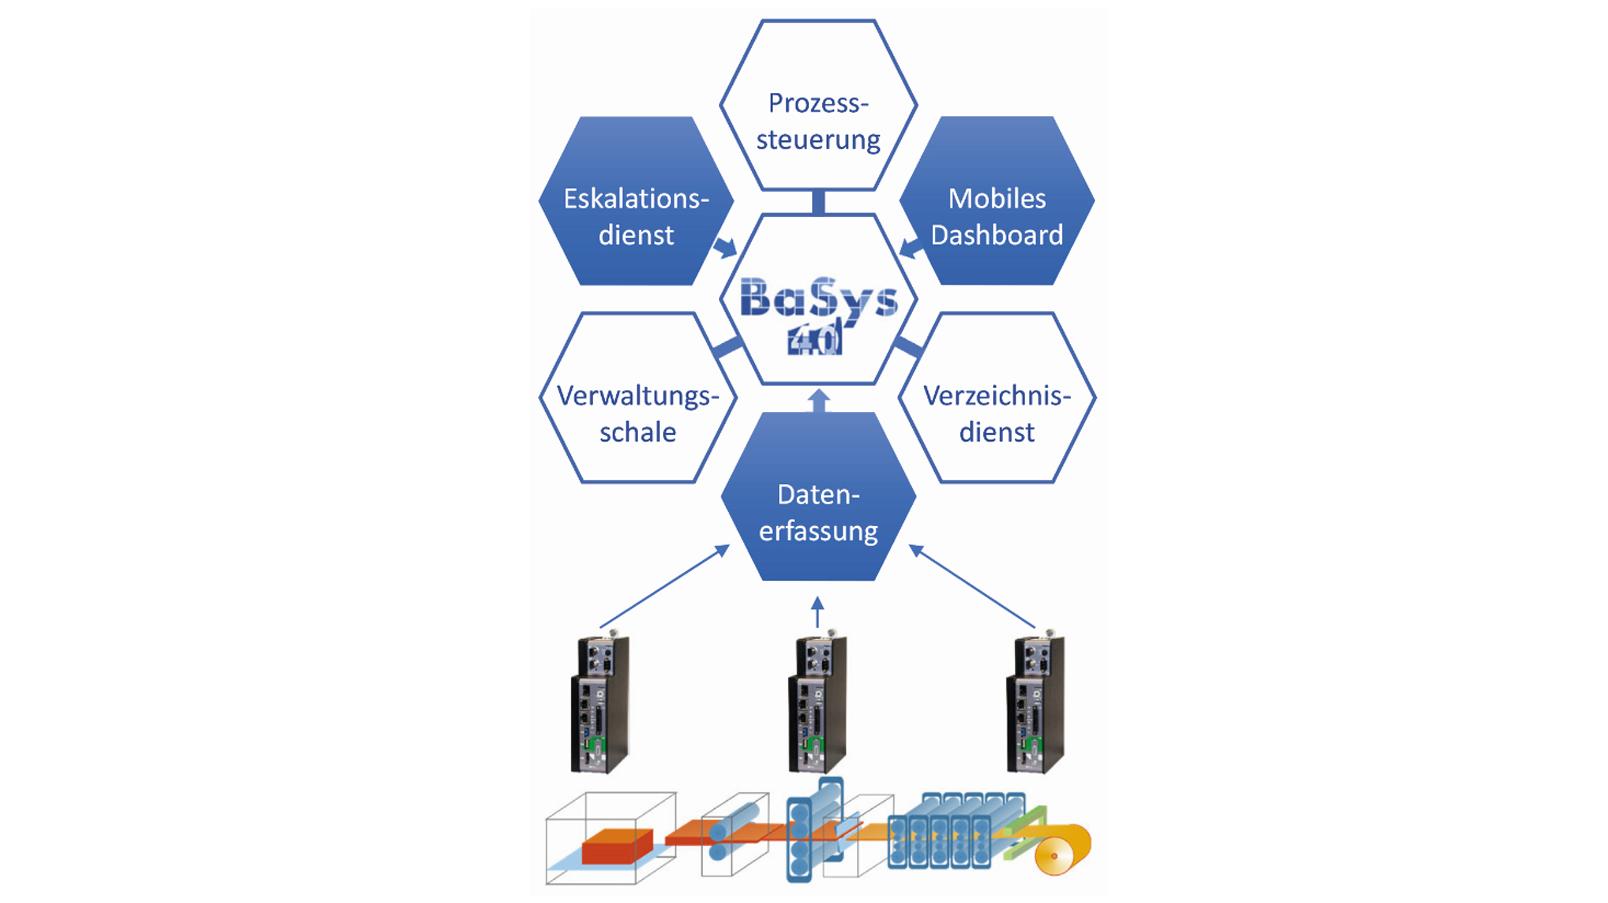 BaSys-BDEVWS - Fraunhofer IESE